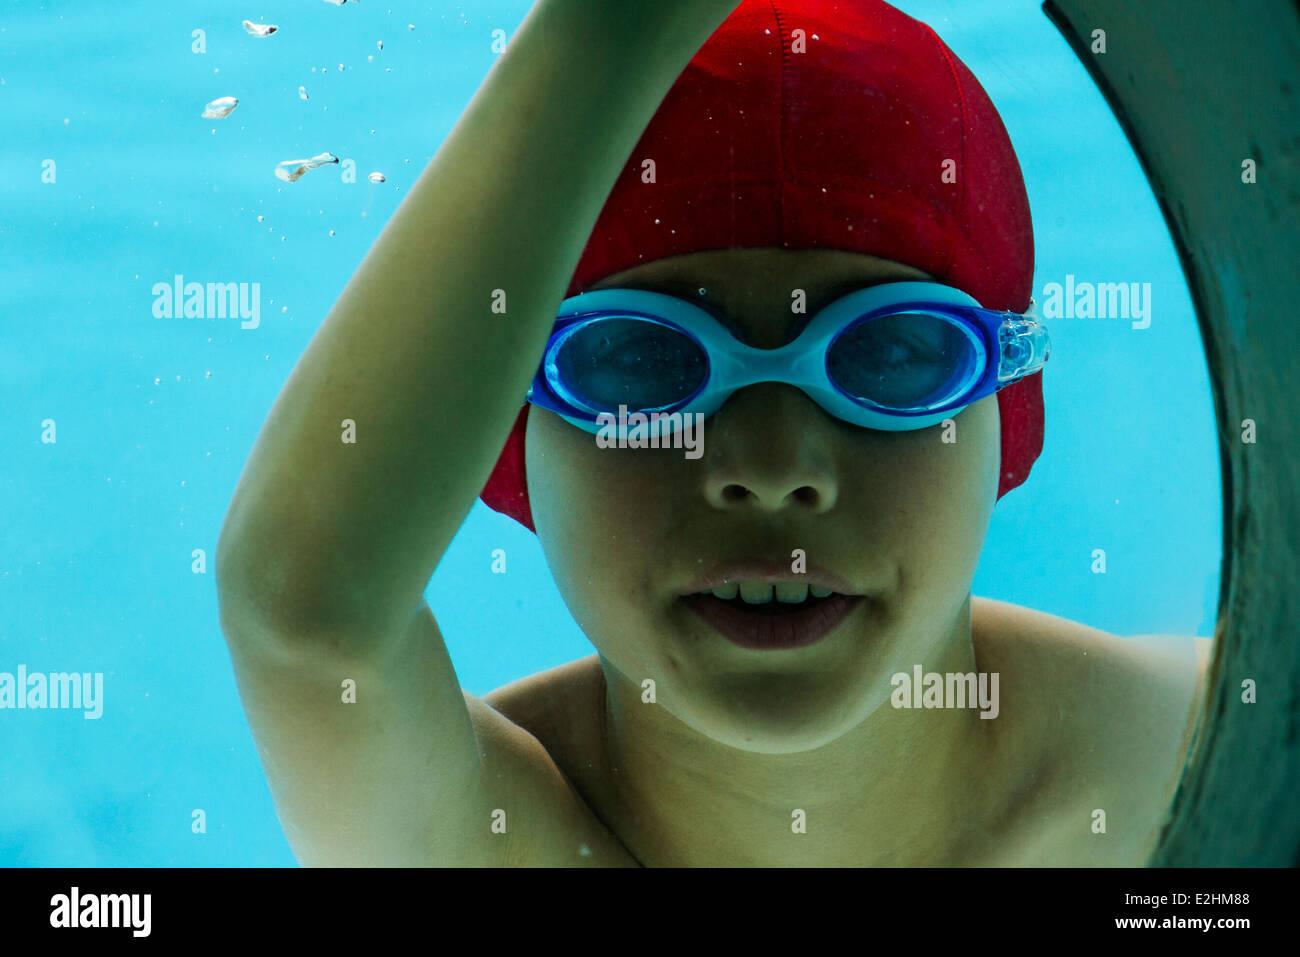 Boy underwater, looking through porthole, portrait - Stock Image